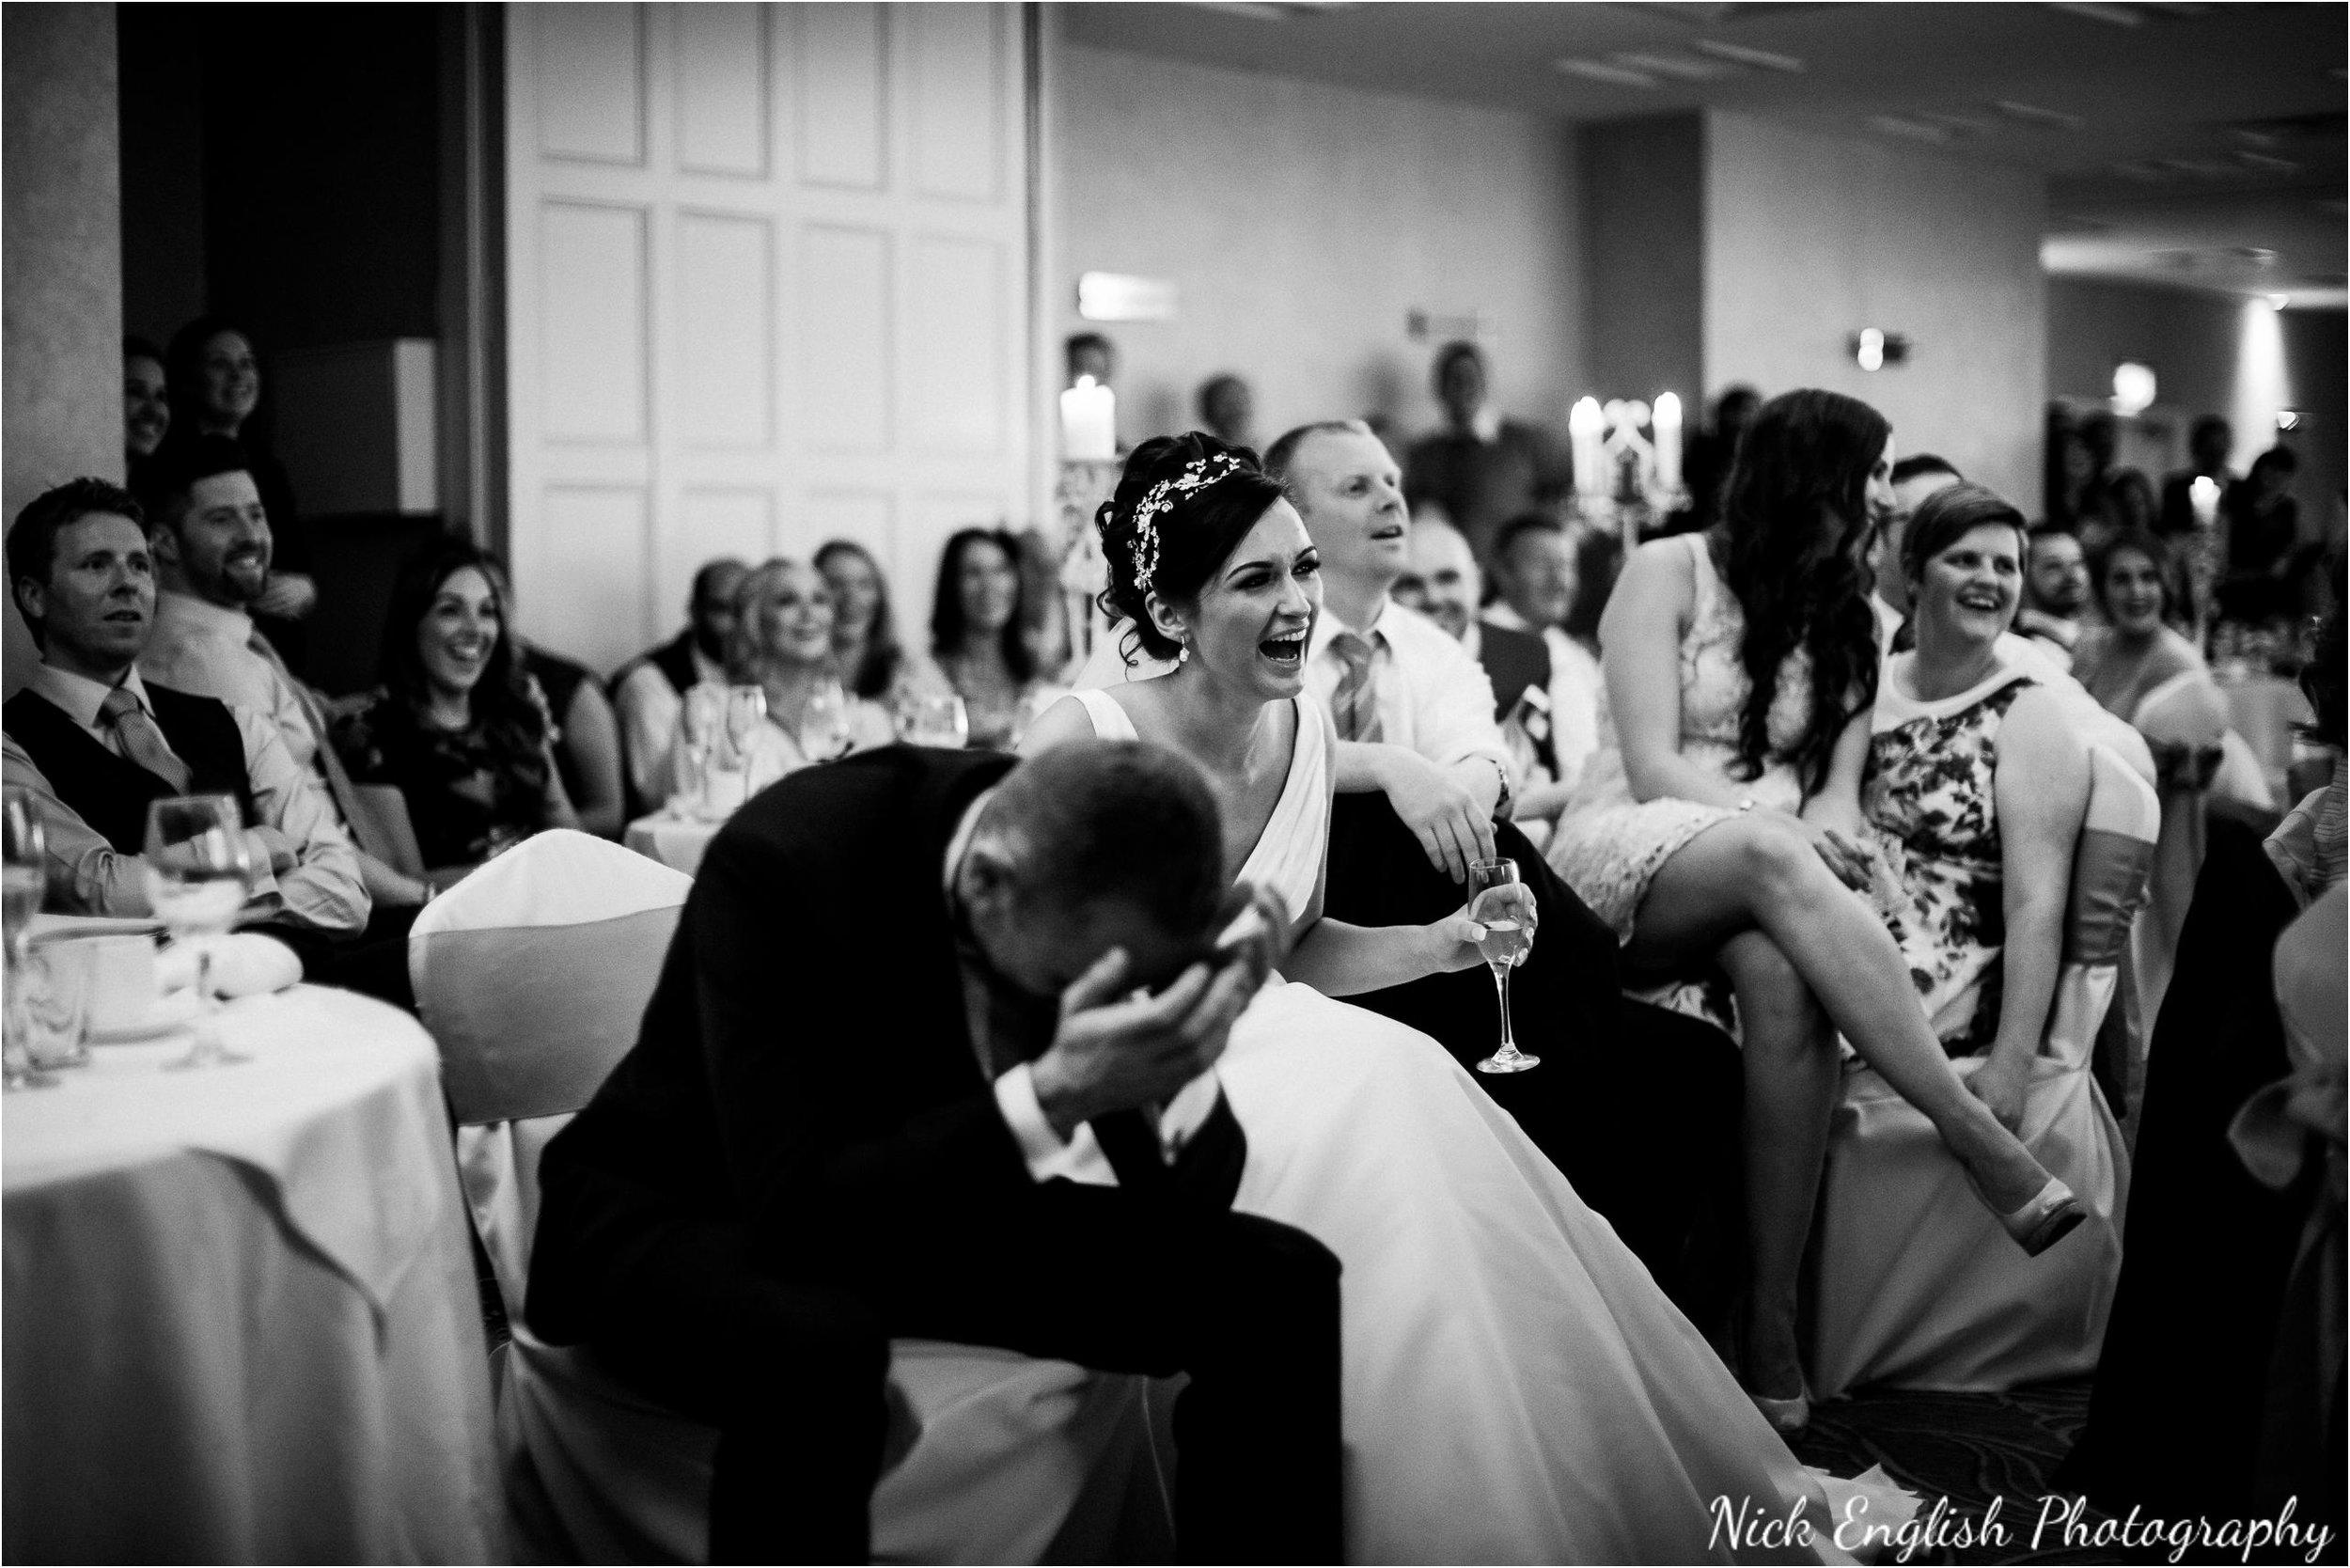 Emily David Wedding Photographs at Barton Grange Preston by Nick English Photography 193jpg.jpeg